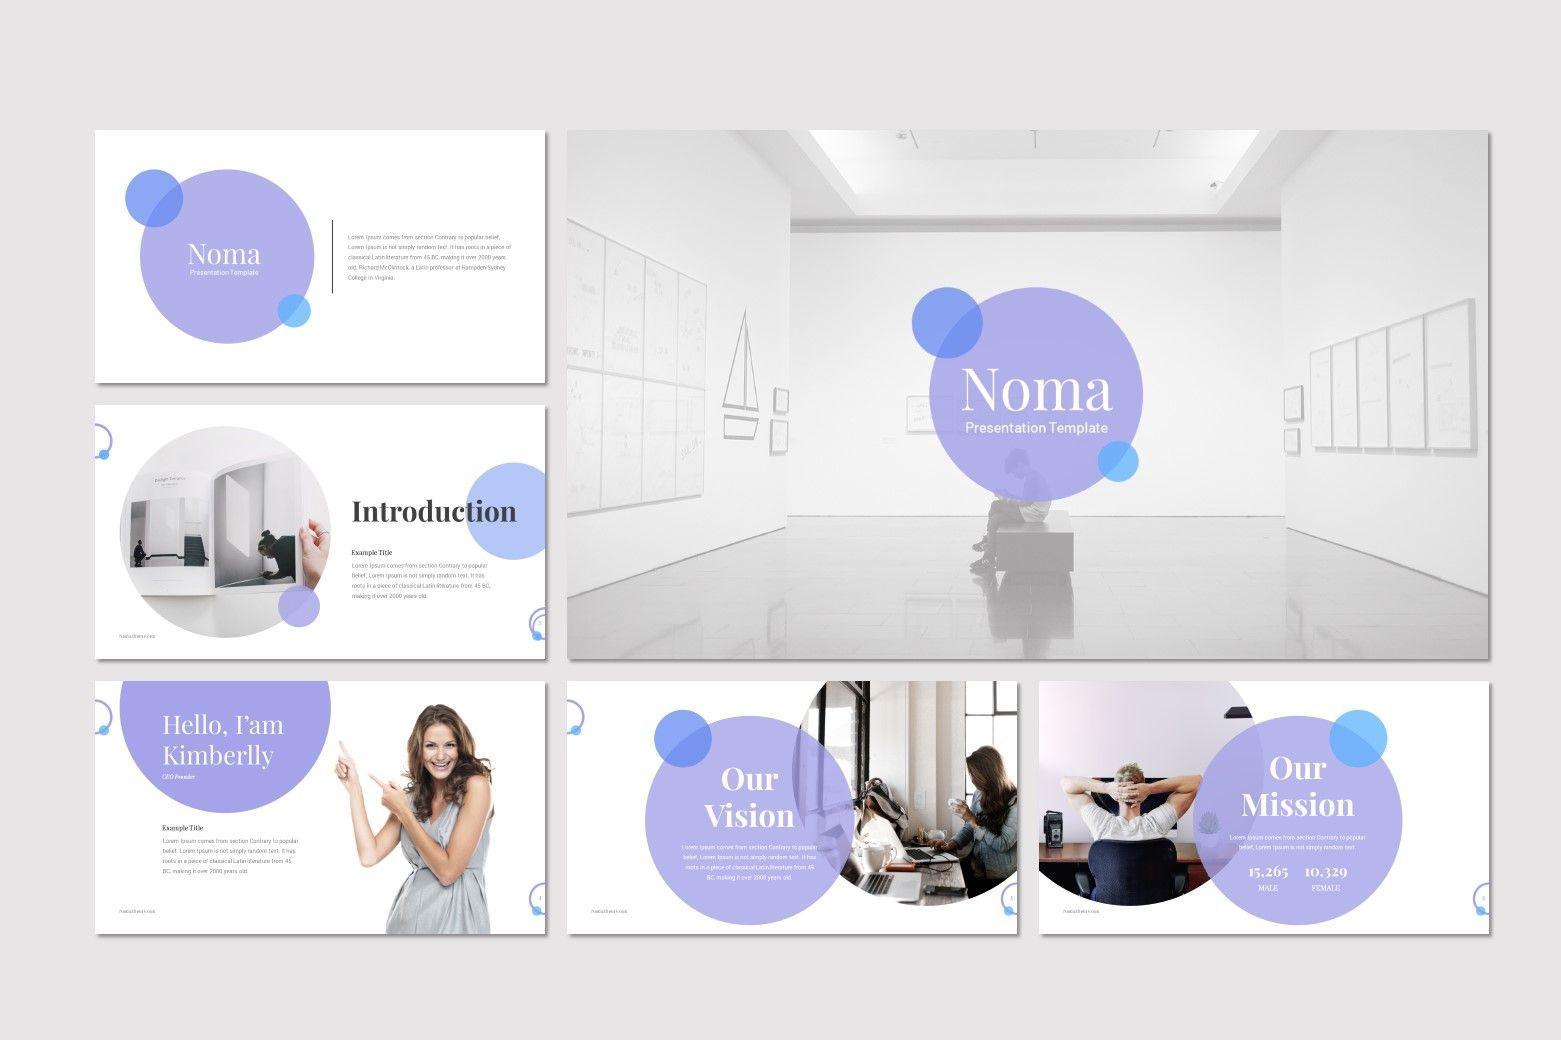 Noma - Google Slides Template, Slide 2, 08302, Presentation Templates — PoweredTemplate.com